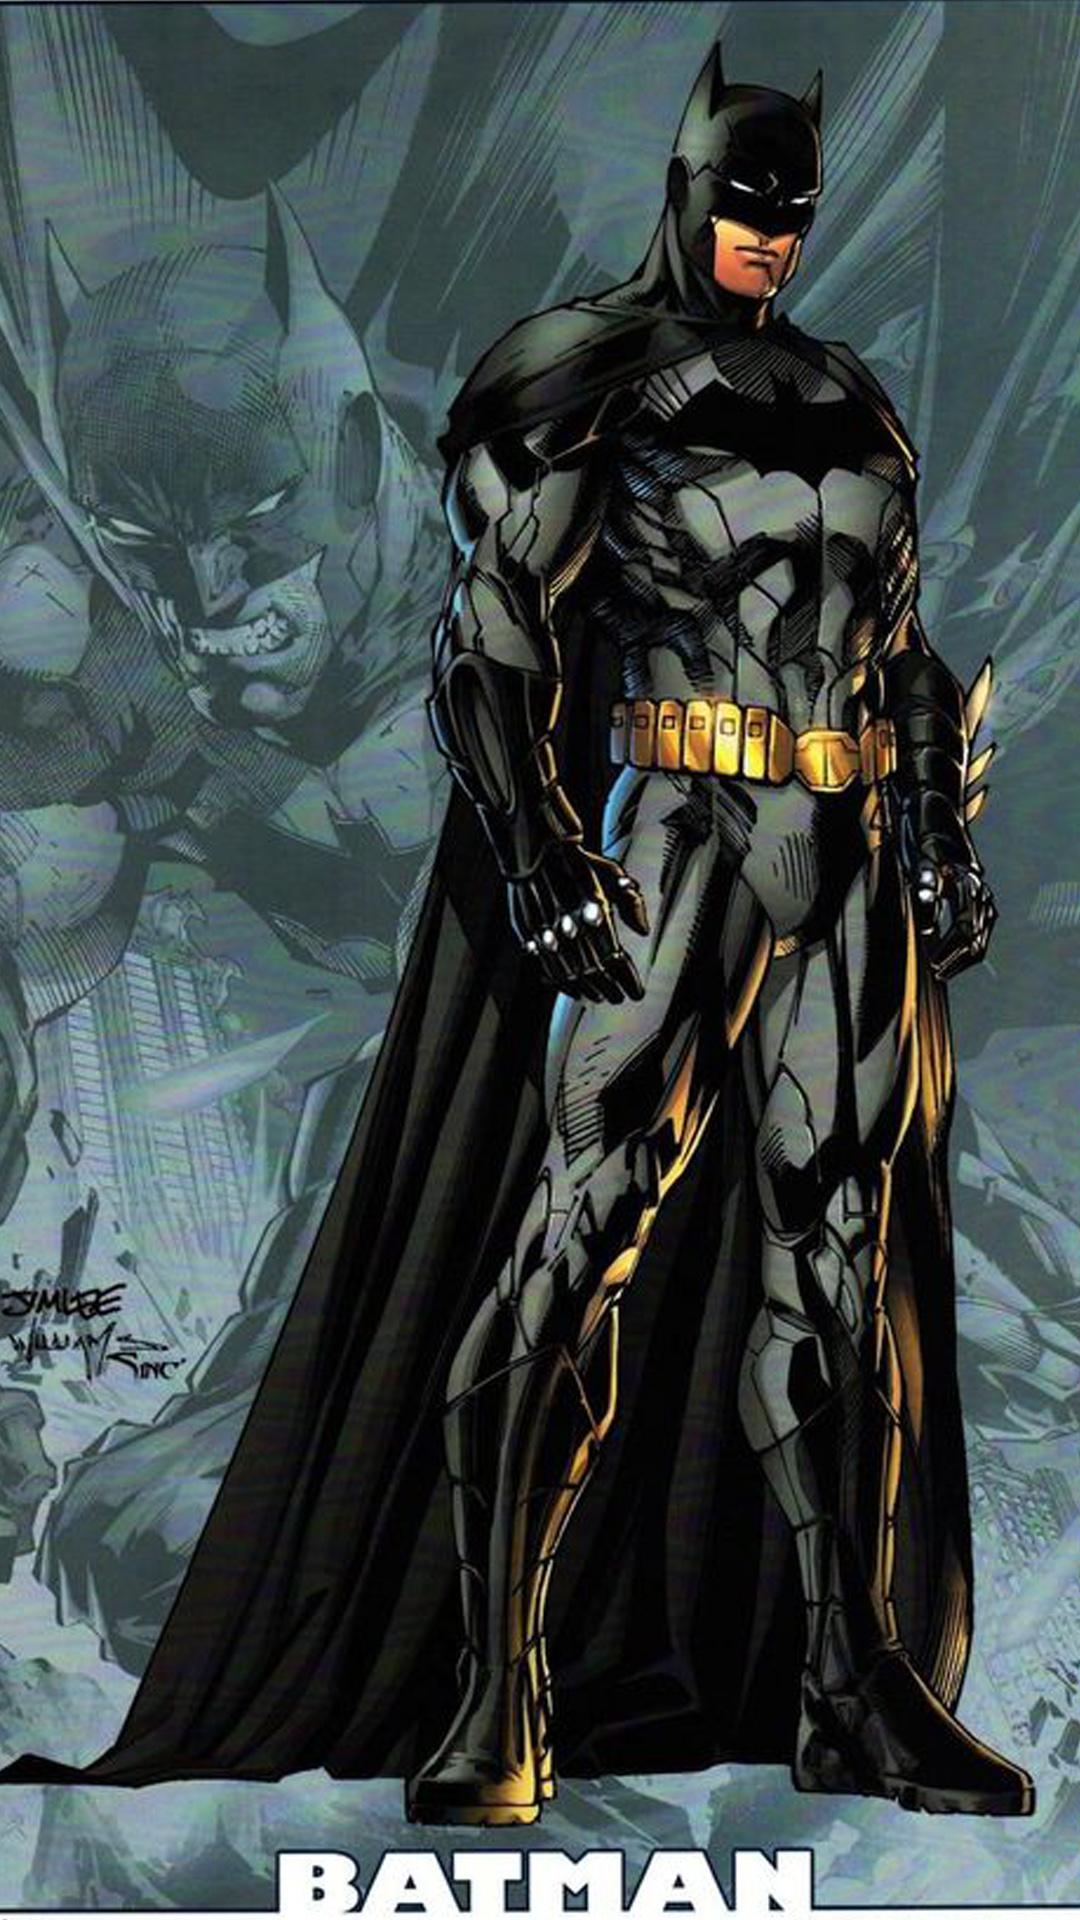 Best HD Batman Wallpapers for iPhone | TechBeasts